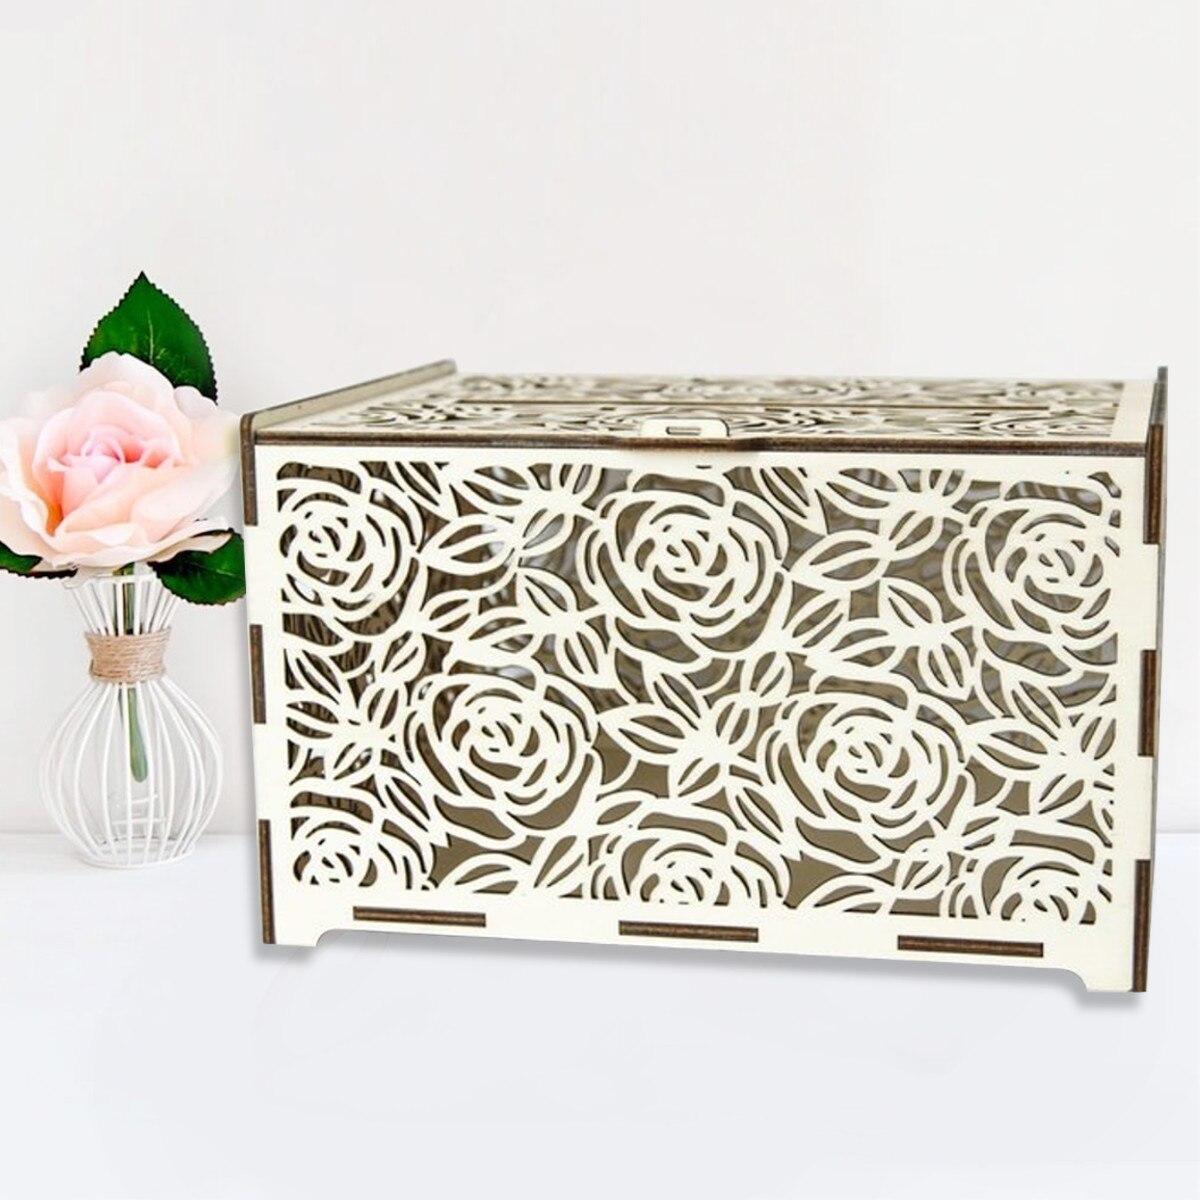 DIY Wedding Gift Card Box Wooden Money Box With Lock Beautiful Wedding Decoration Supplies For Birthday Party New 30x24x21cm